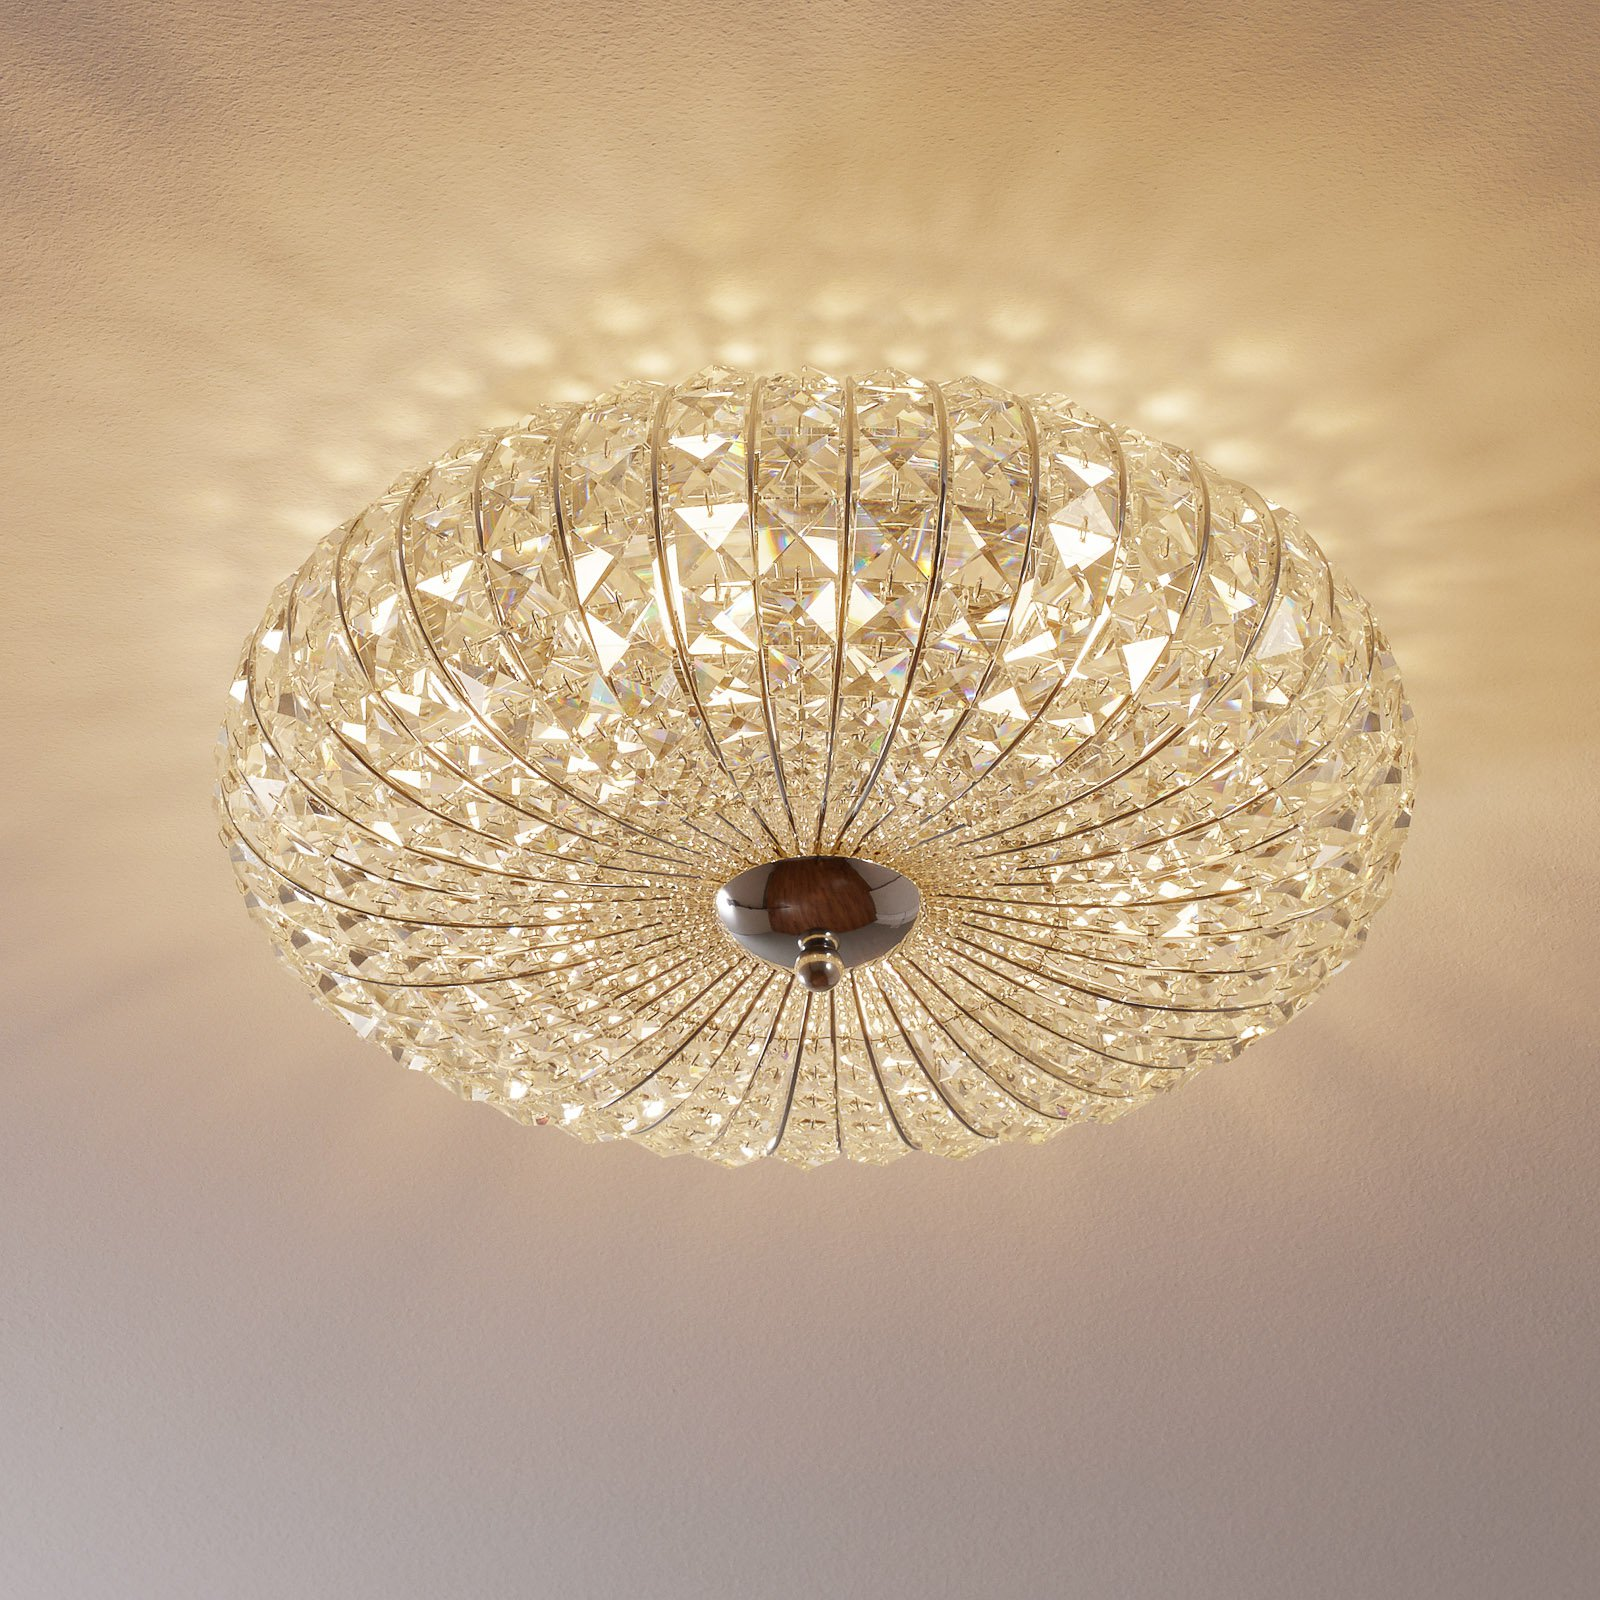 Broche taklampe med krystaller, Ø 49 cm